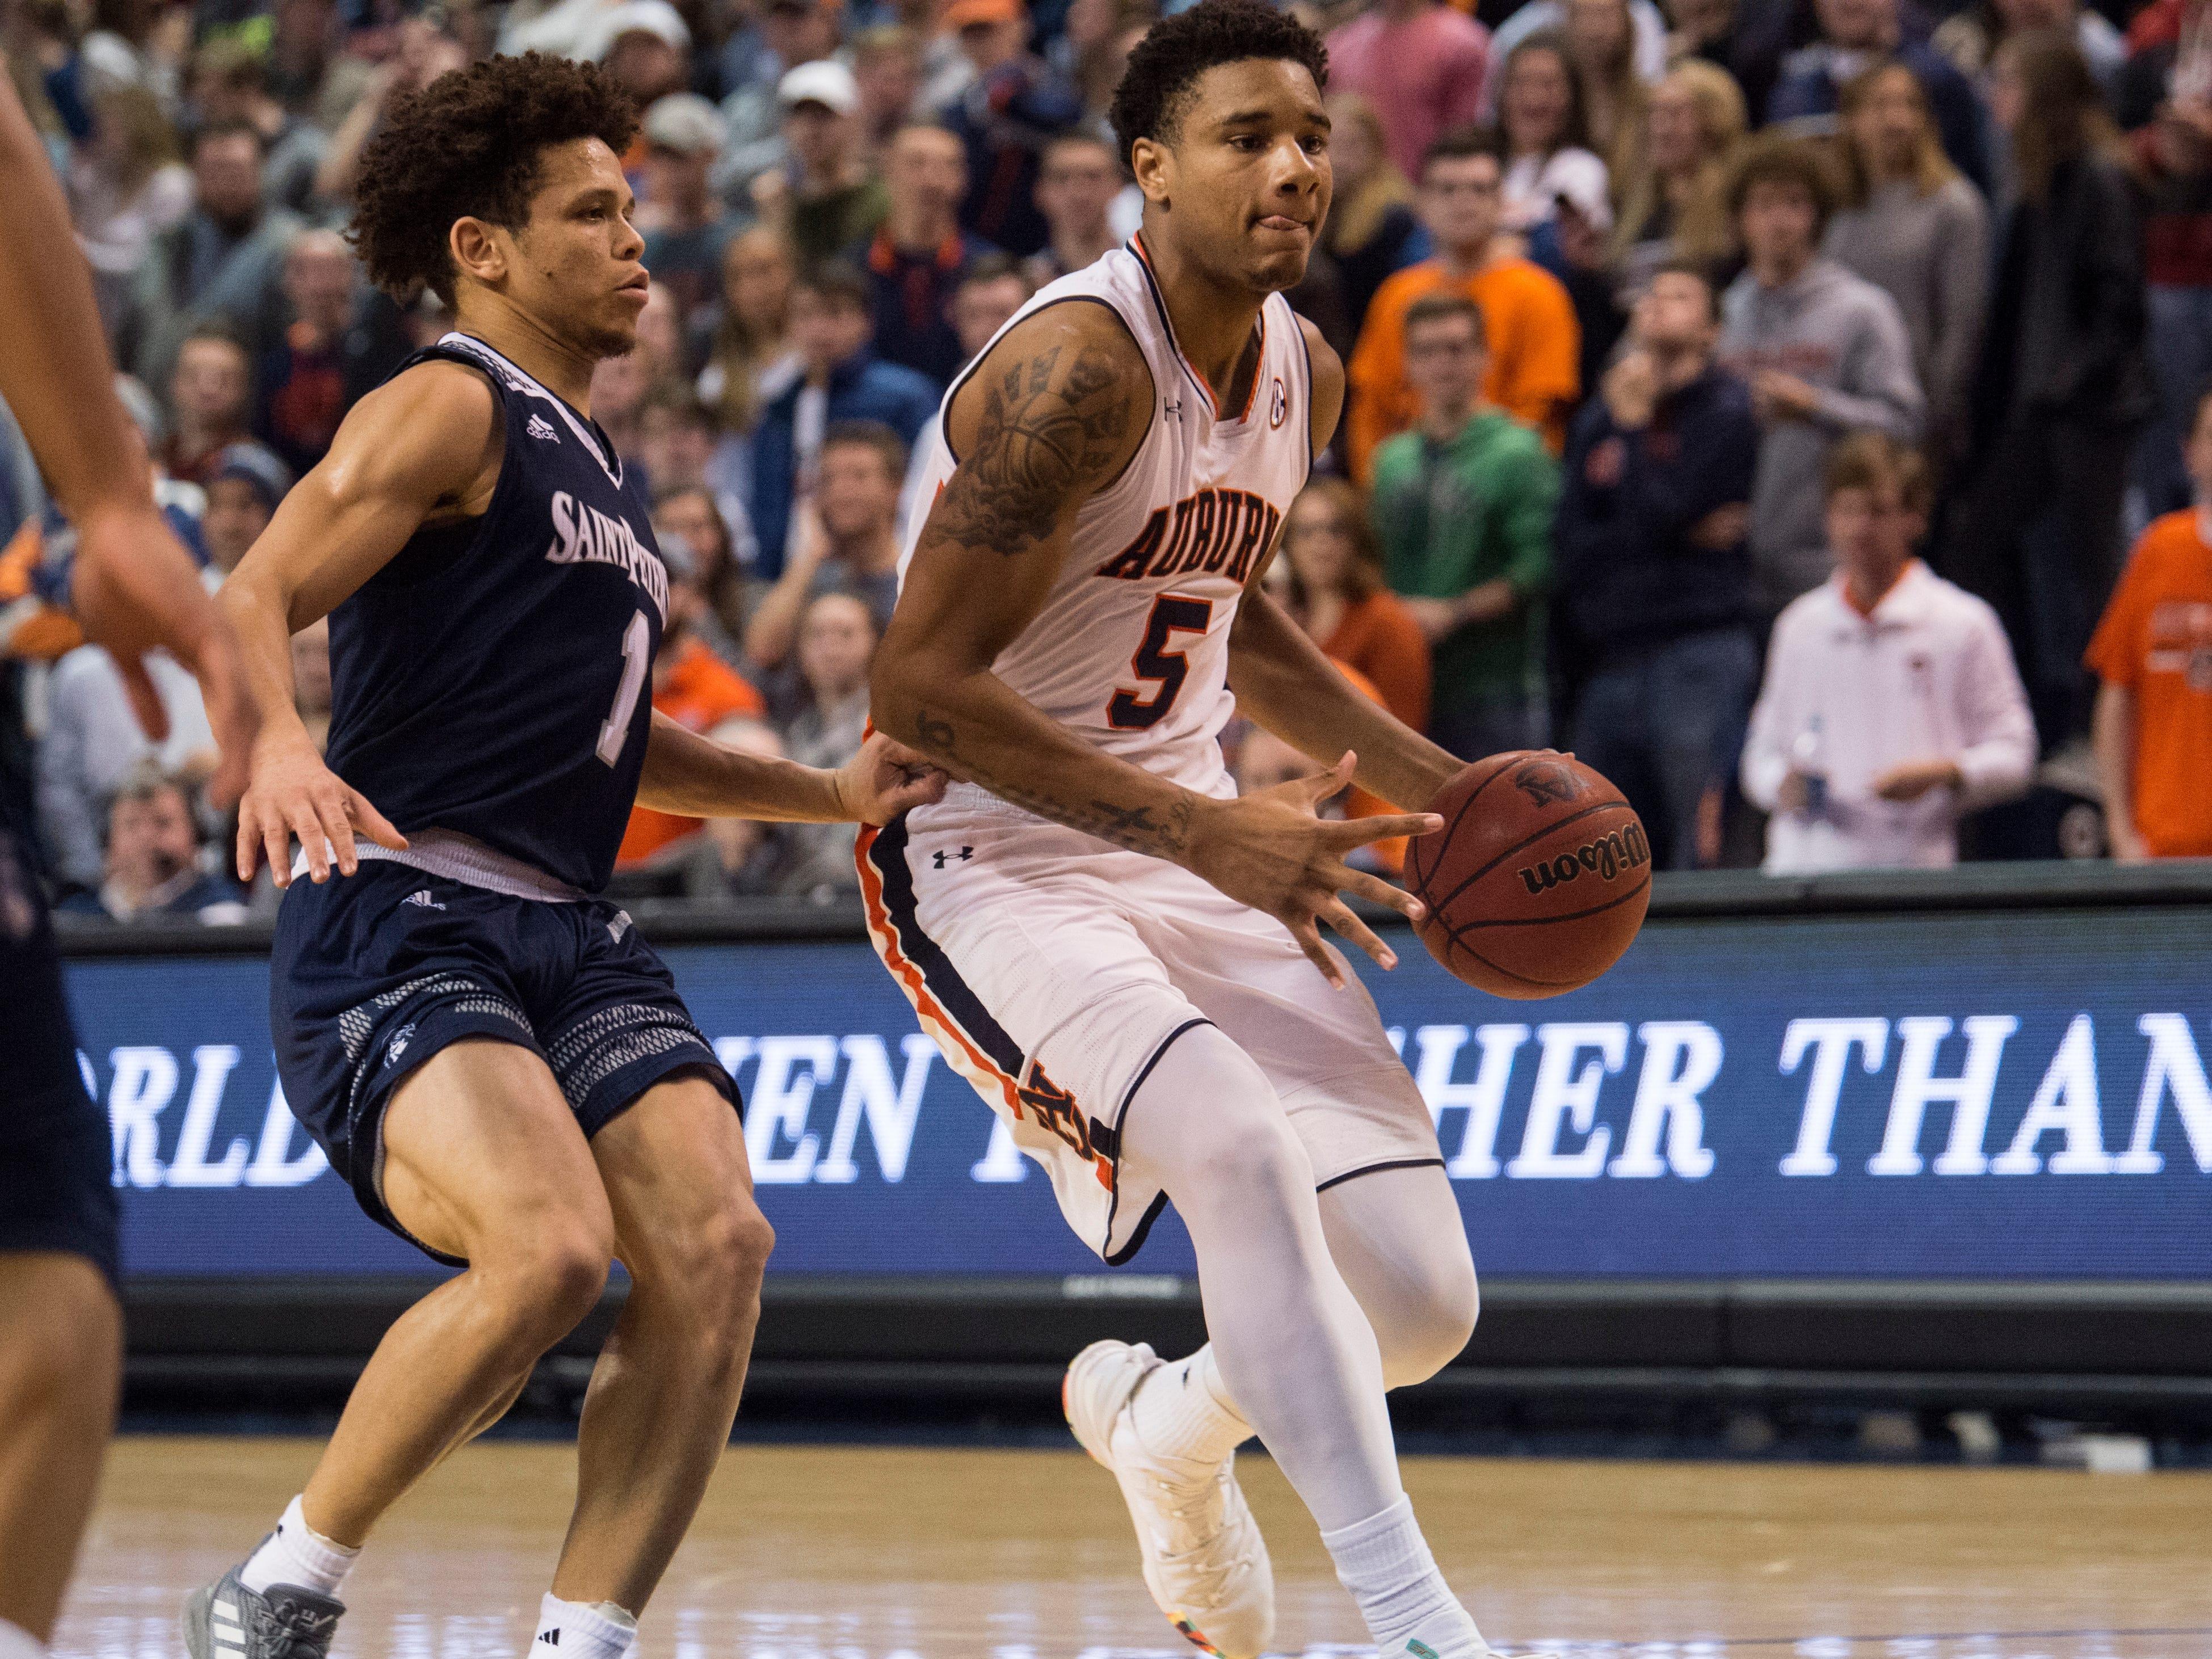 Auburn forward Chuma Okeke (5) drives to the basket at Auburn Arena in Auburn, Ala., on Wednesday, Nov. 28, 2018. Auburn defeated Saint Peter's 99-49.